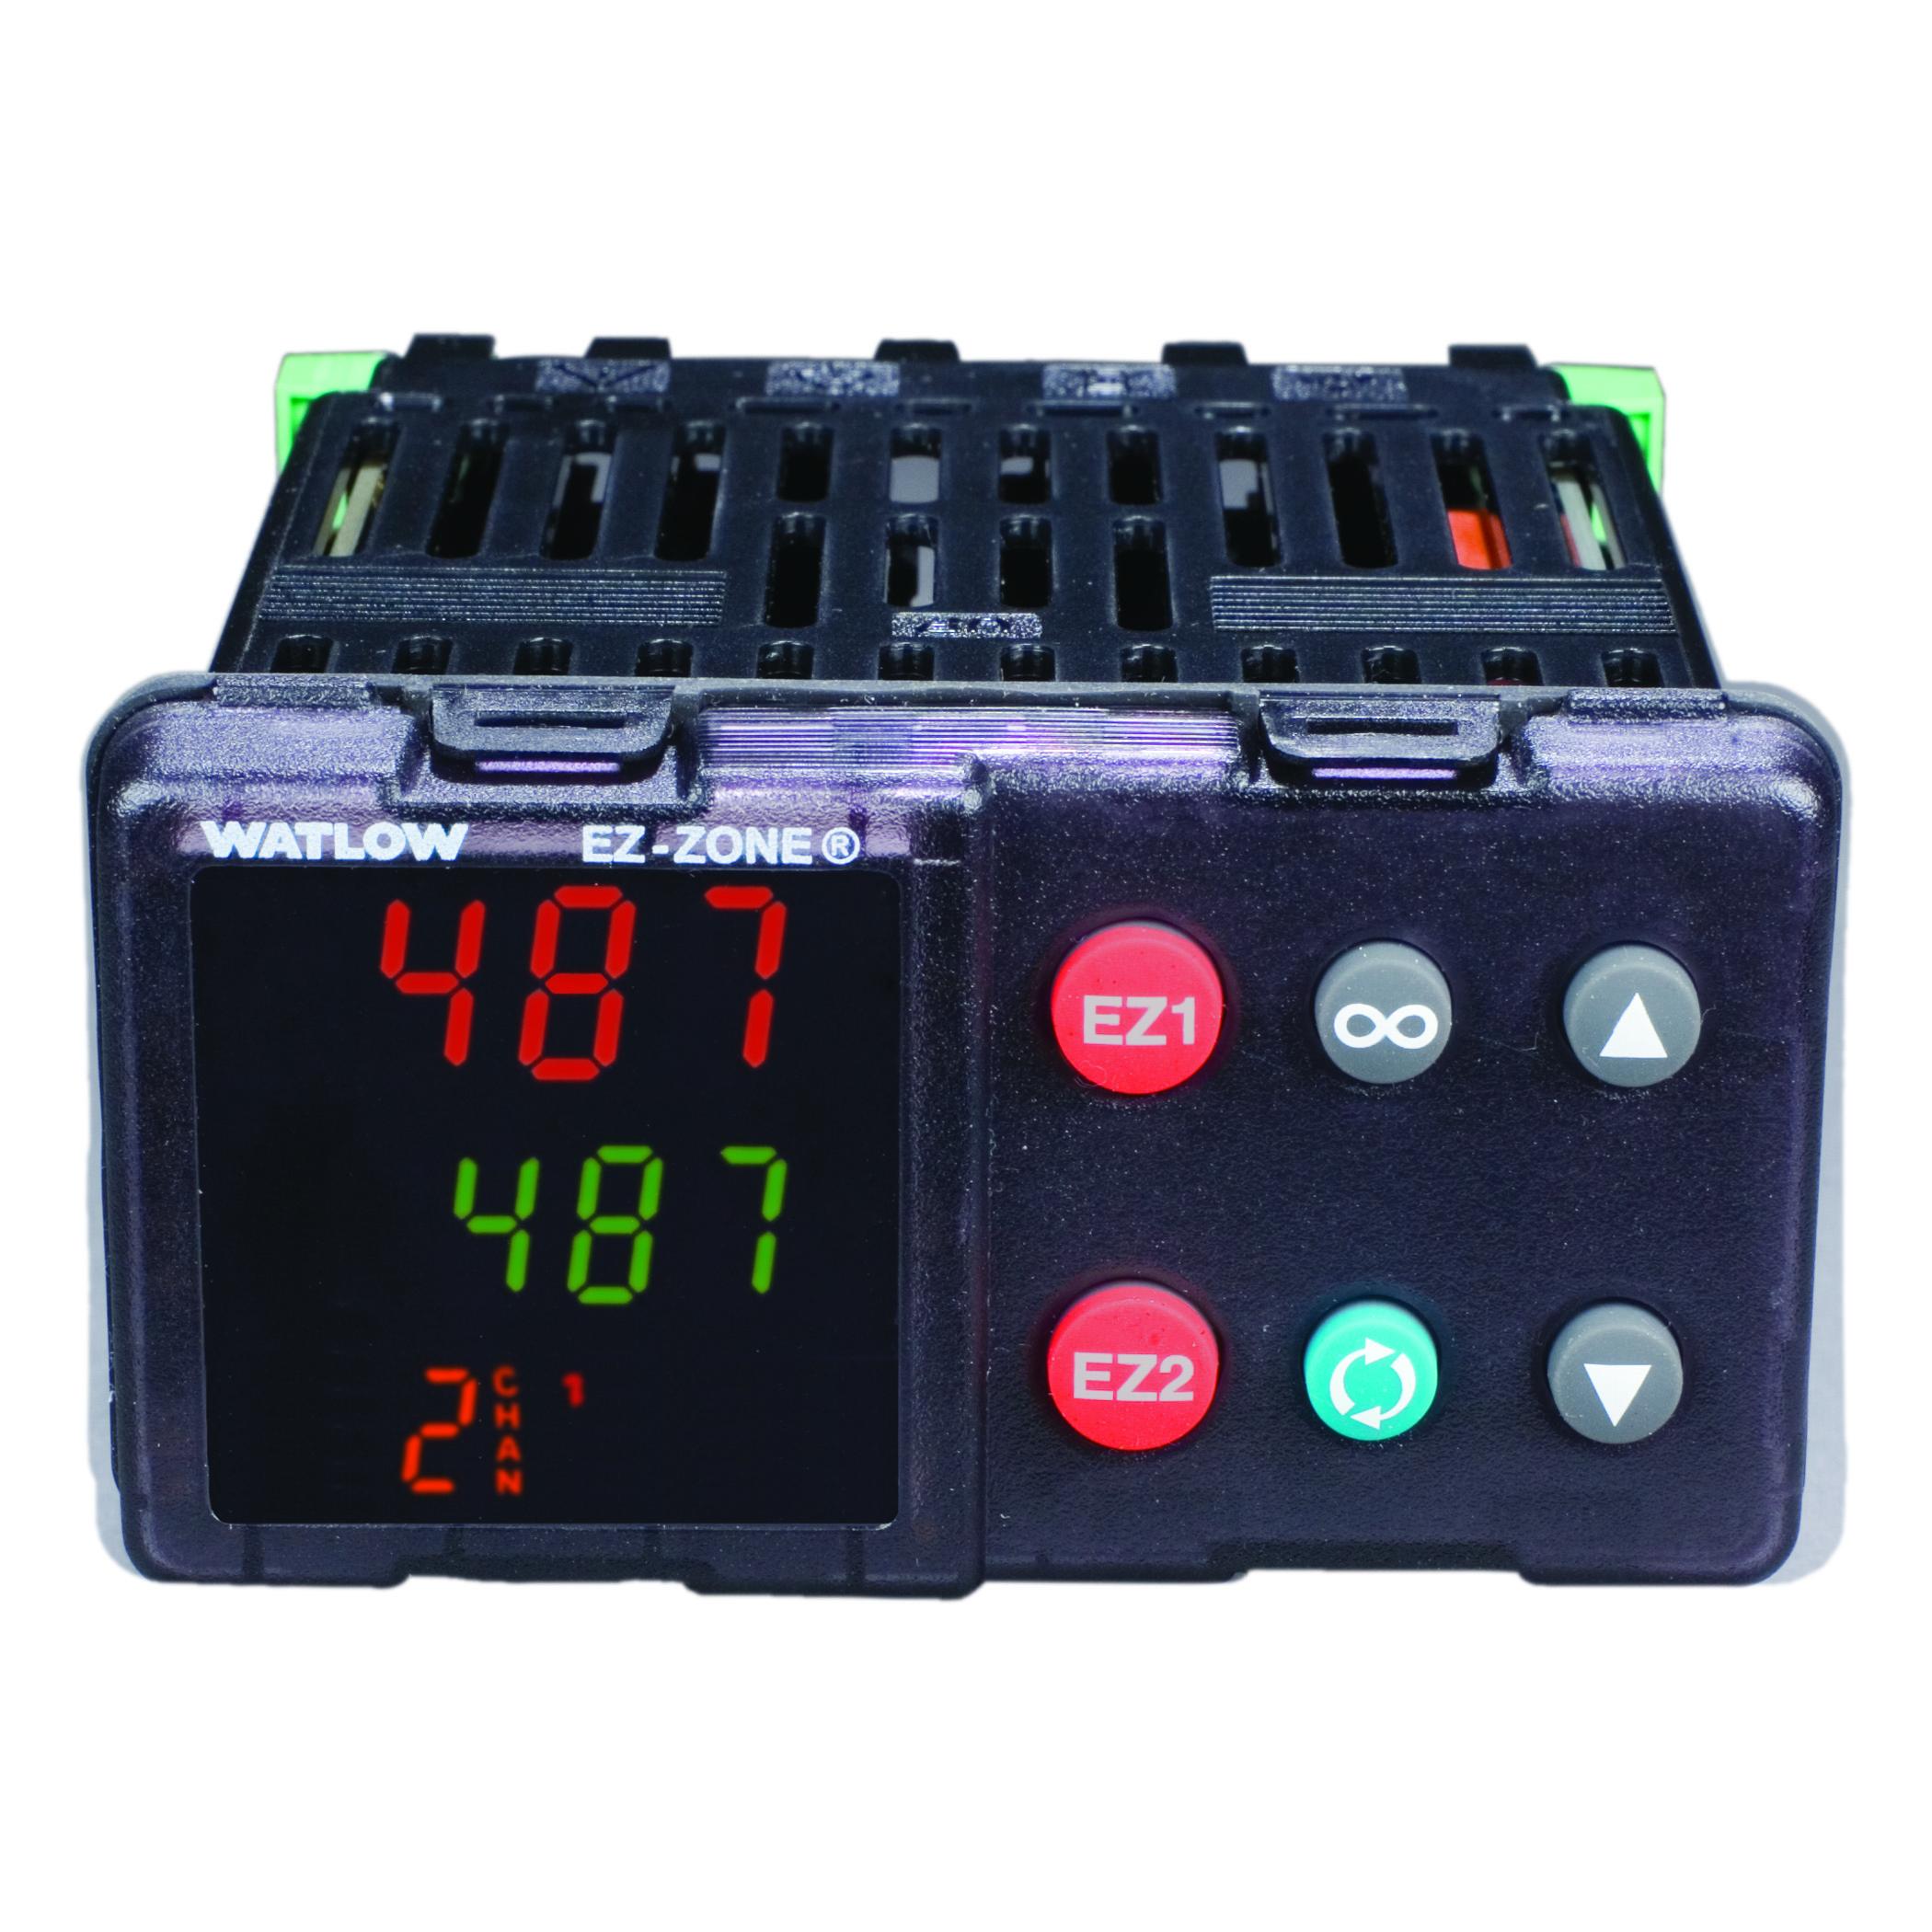 pm9c1ca aaaadaa seagate control systems EZ Golf Cart Wiring Diagram watlow pm9